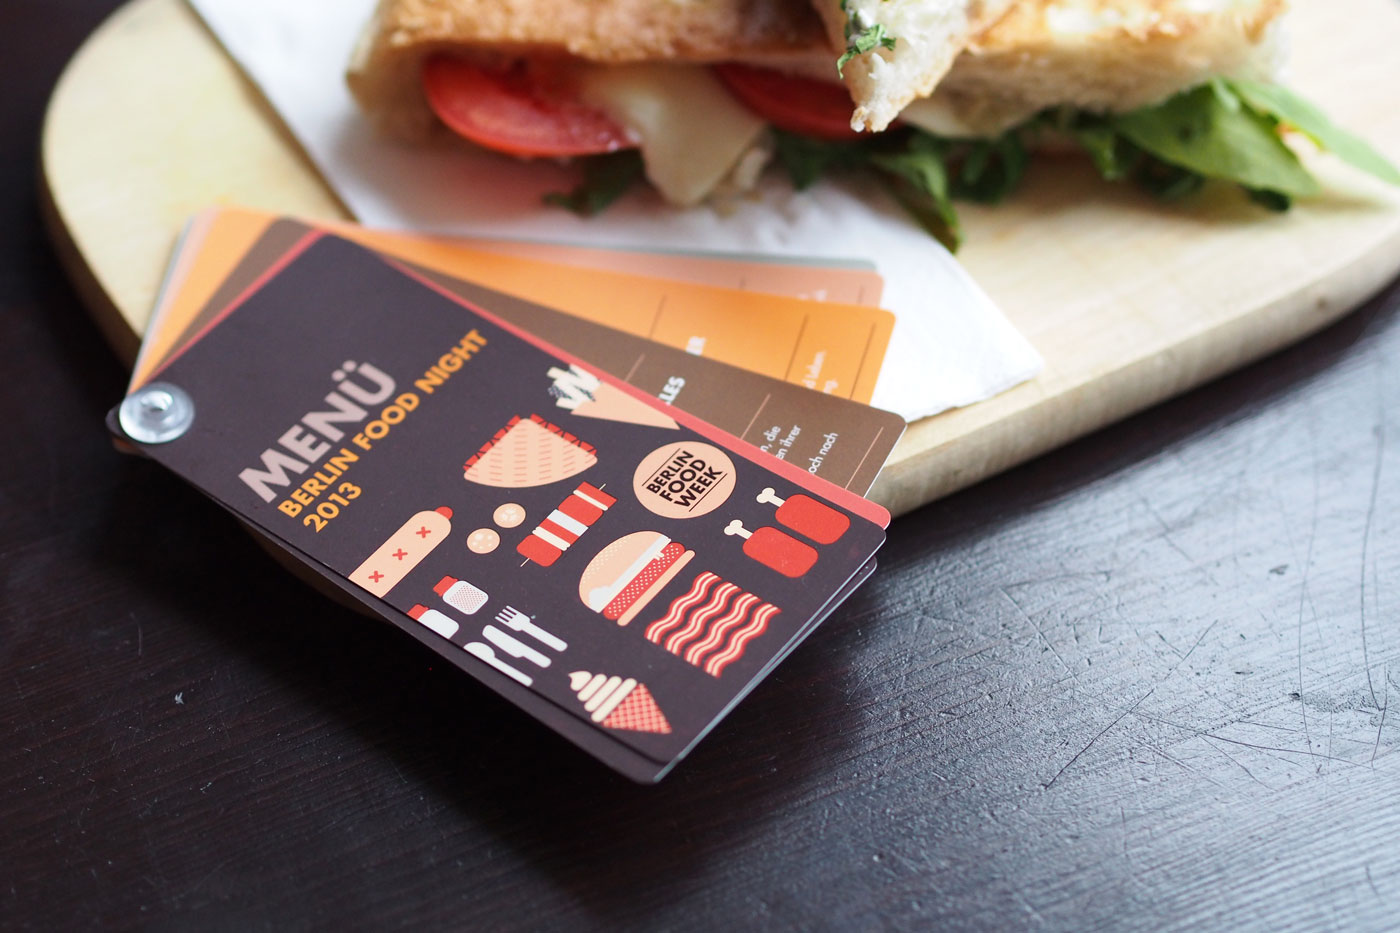 Berlin Food Night / Berlin Food Week - Design - upstruct